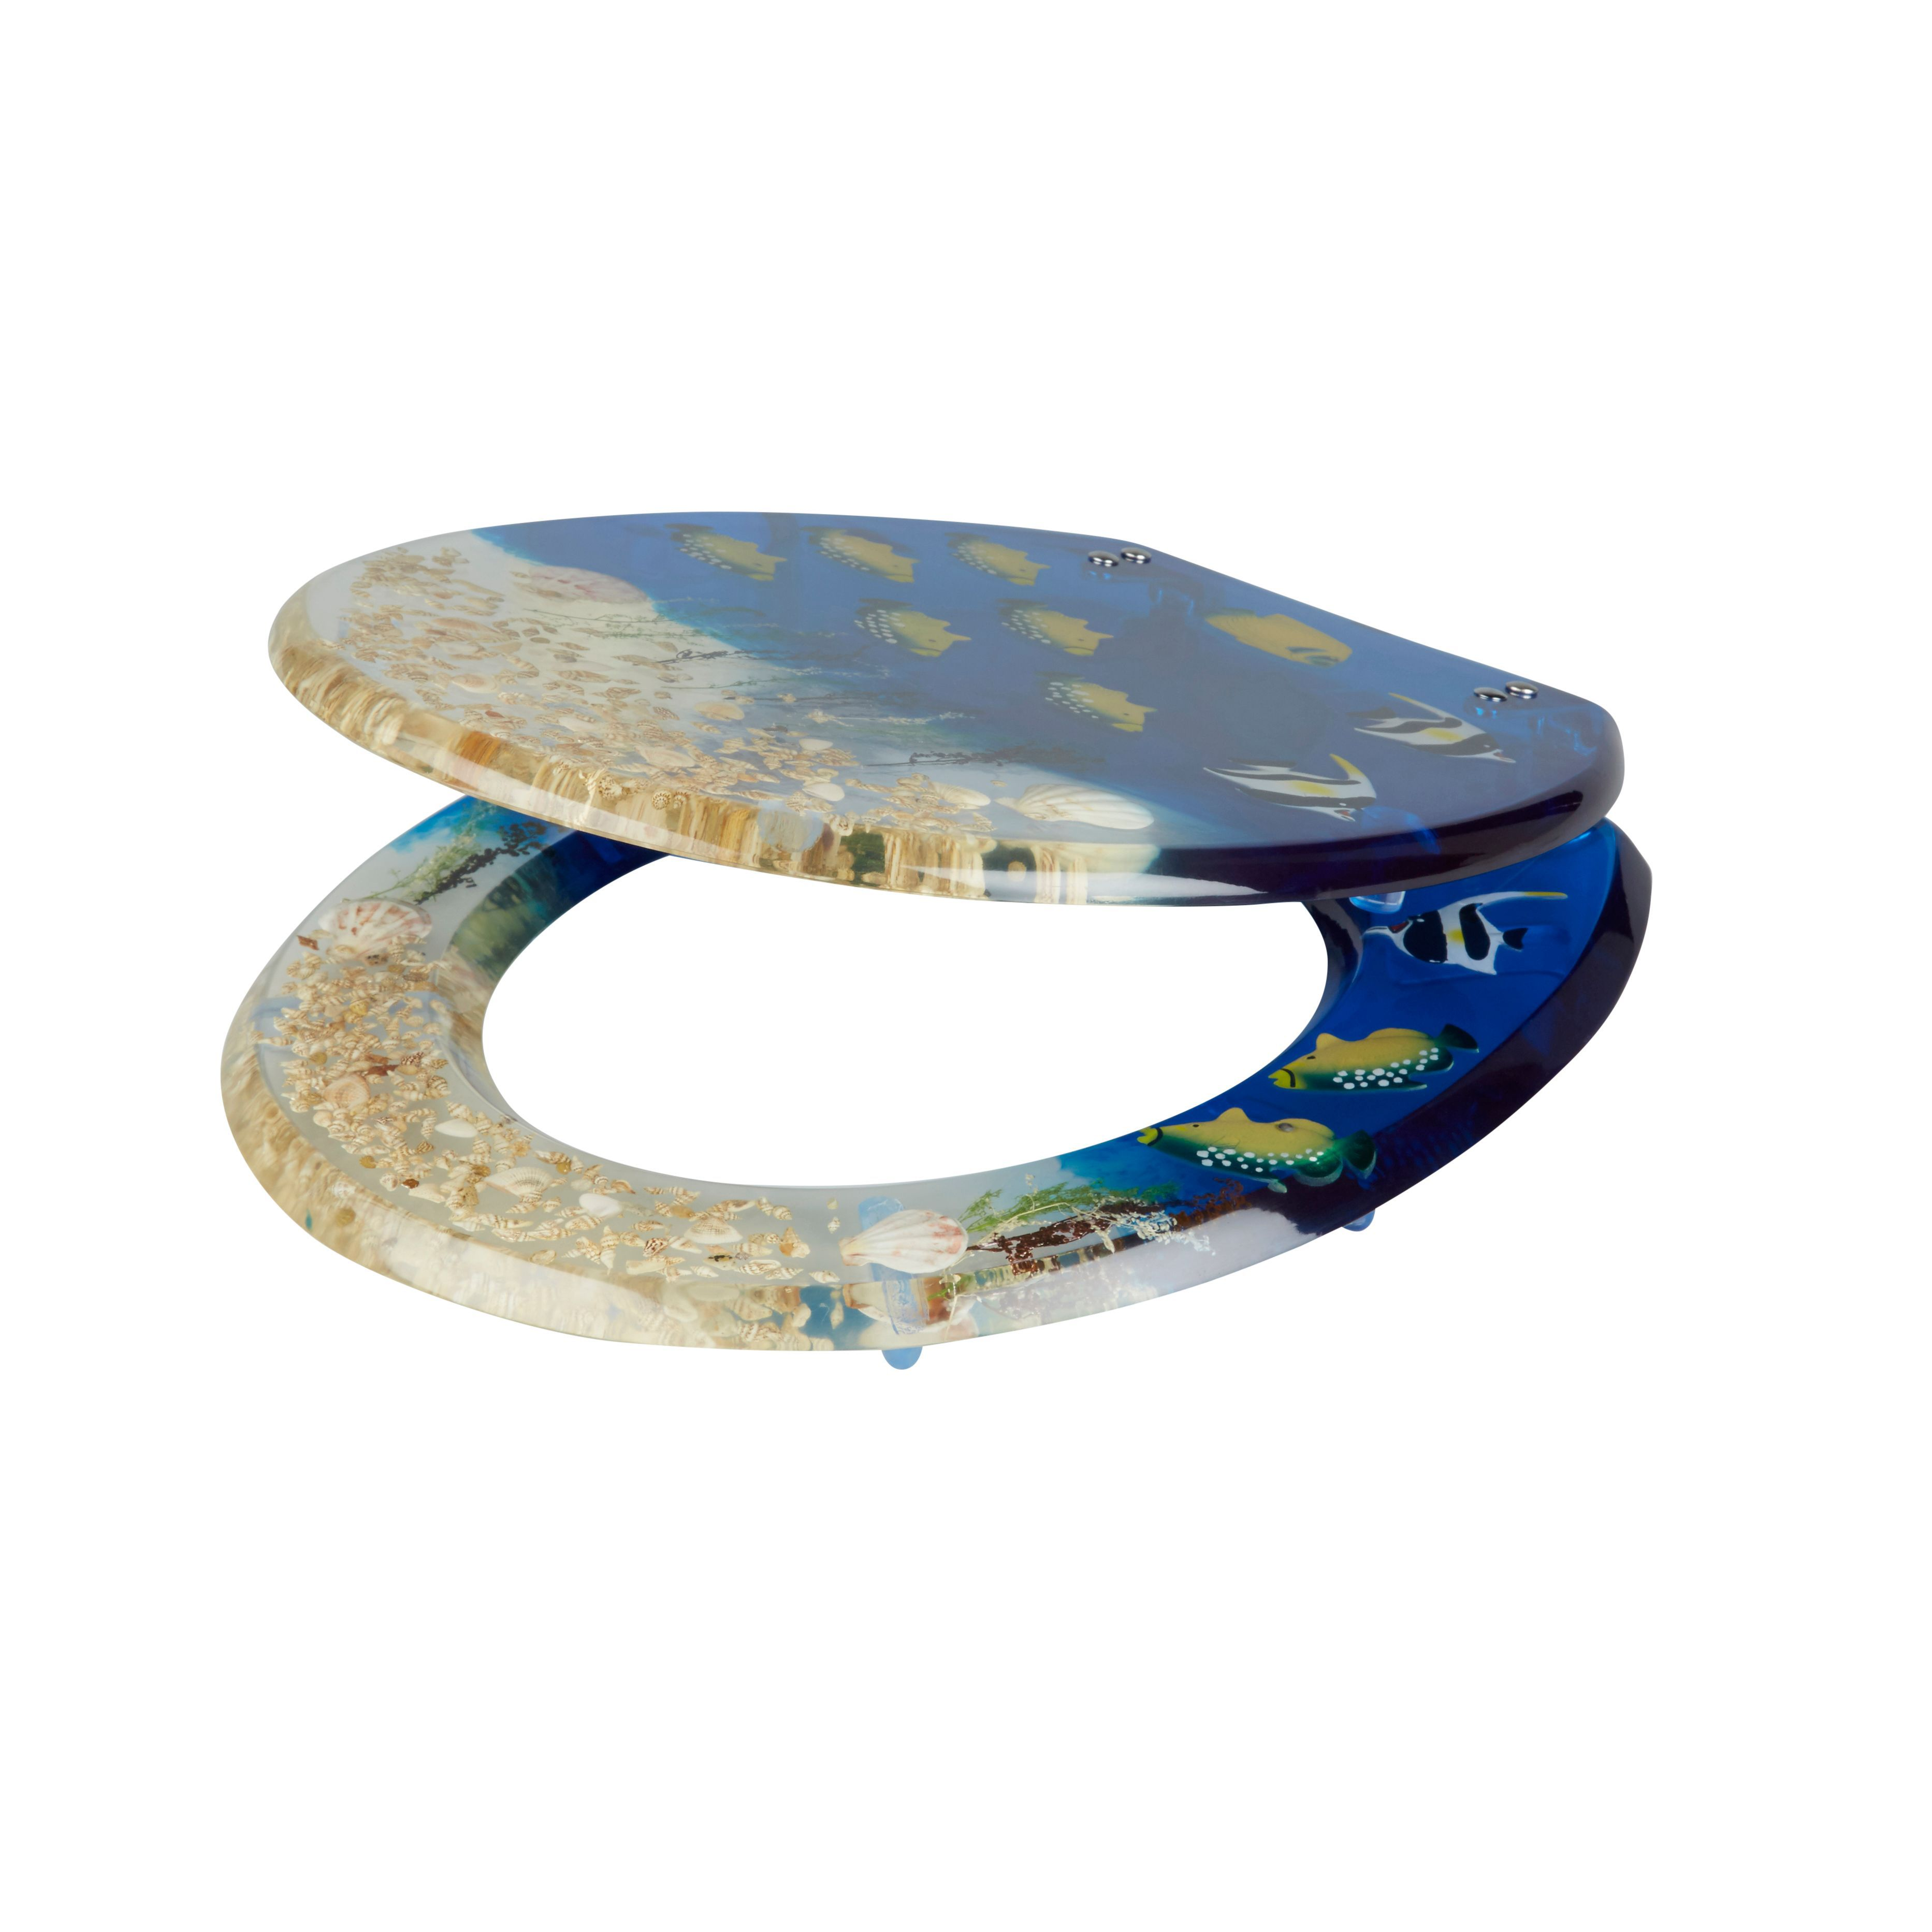 Cooke Lewis Andrano Multicolour Tropical Fish Standard Close Toilet Sea